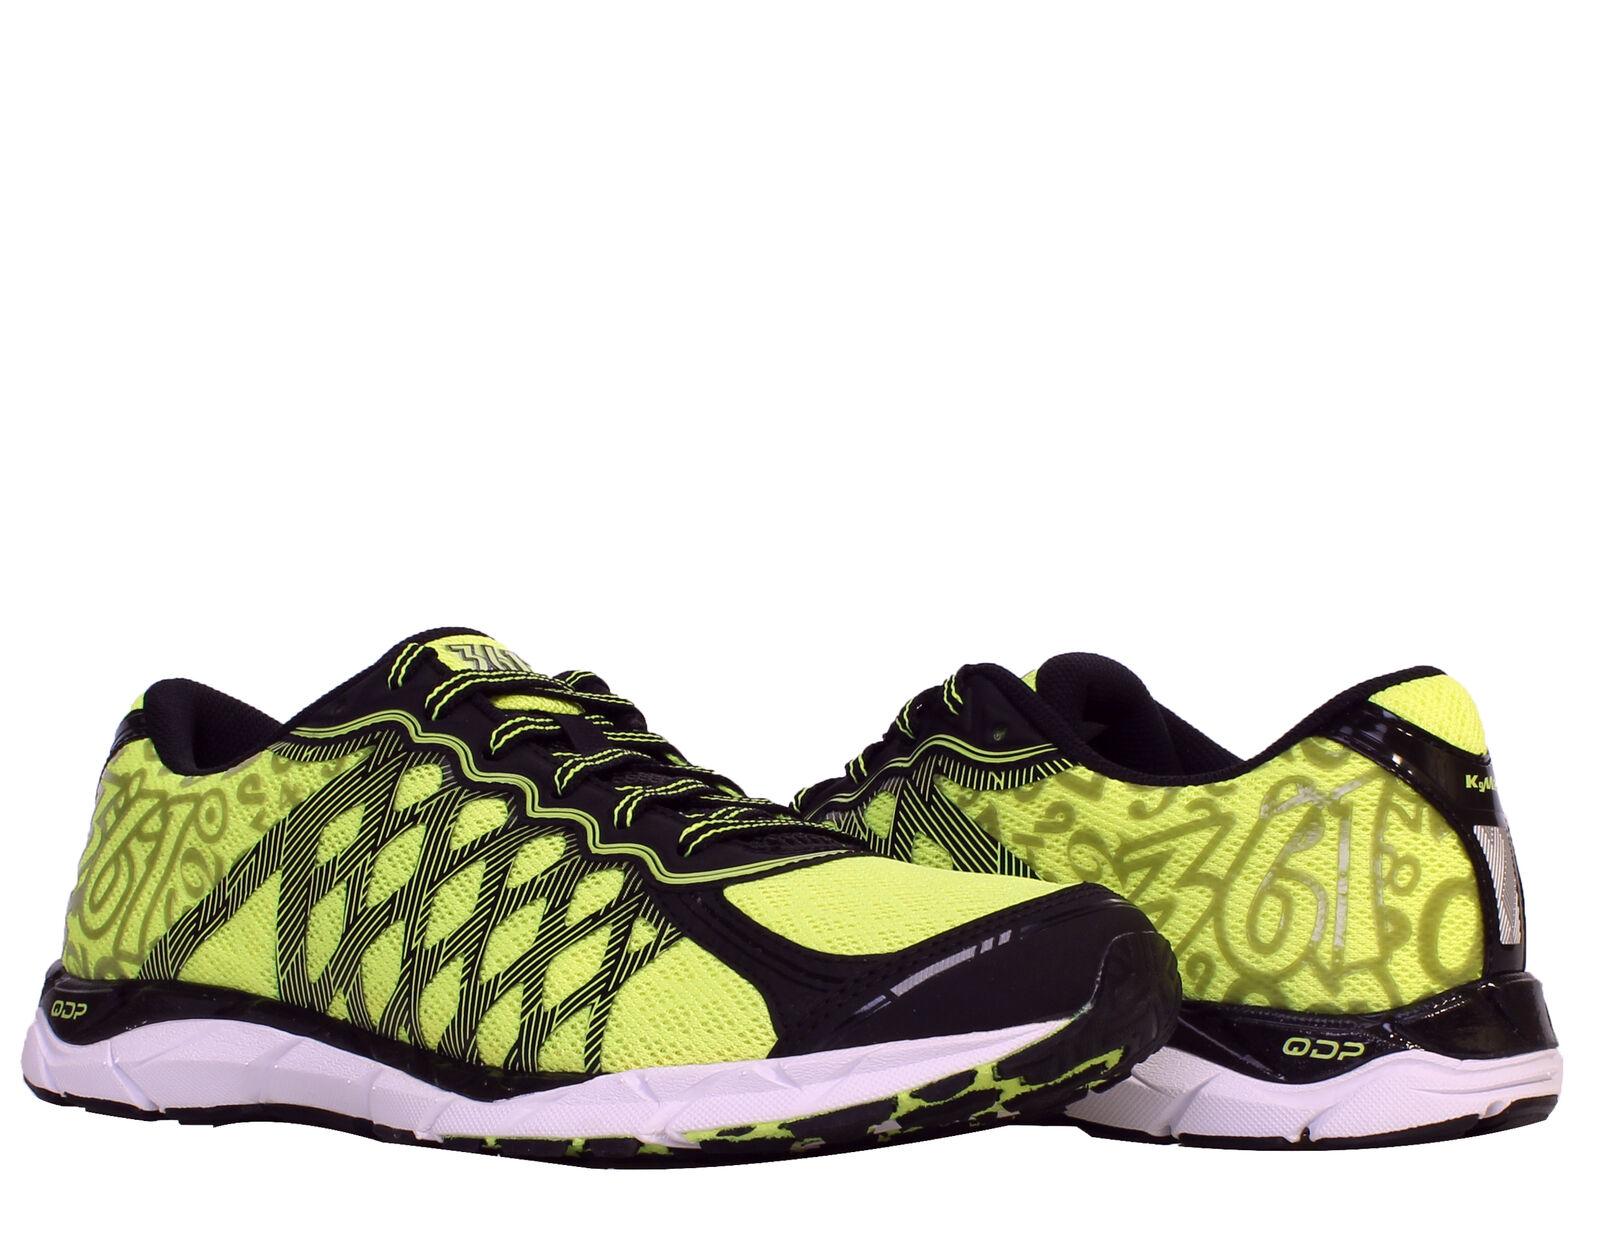 361 KgM2 Black Flash Yellow Men's Running shoes 101610114-1038